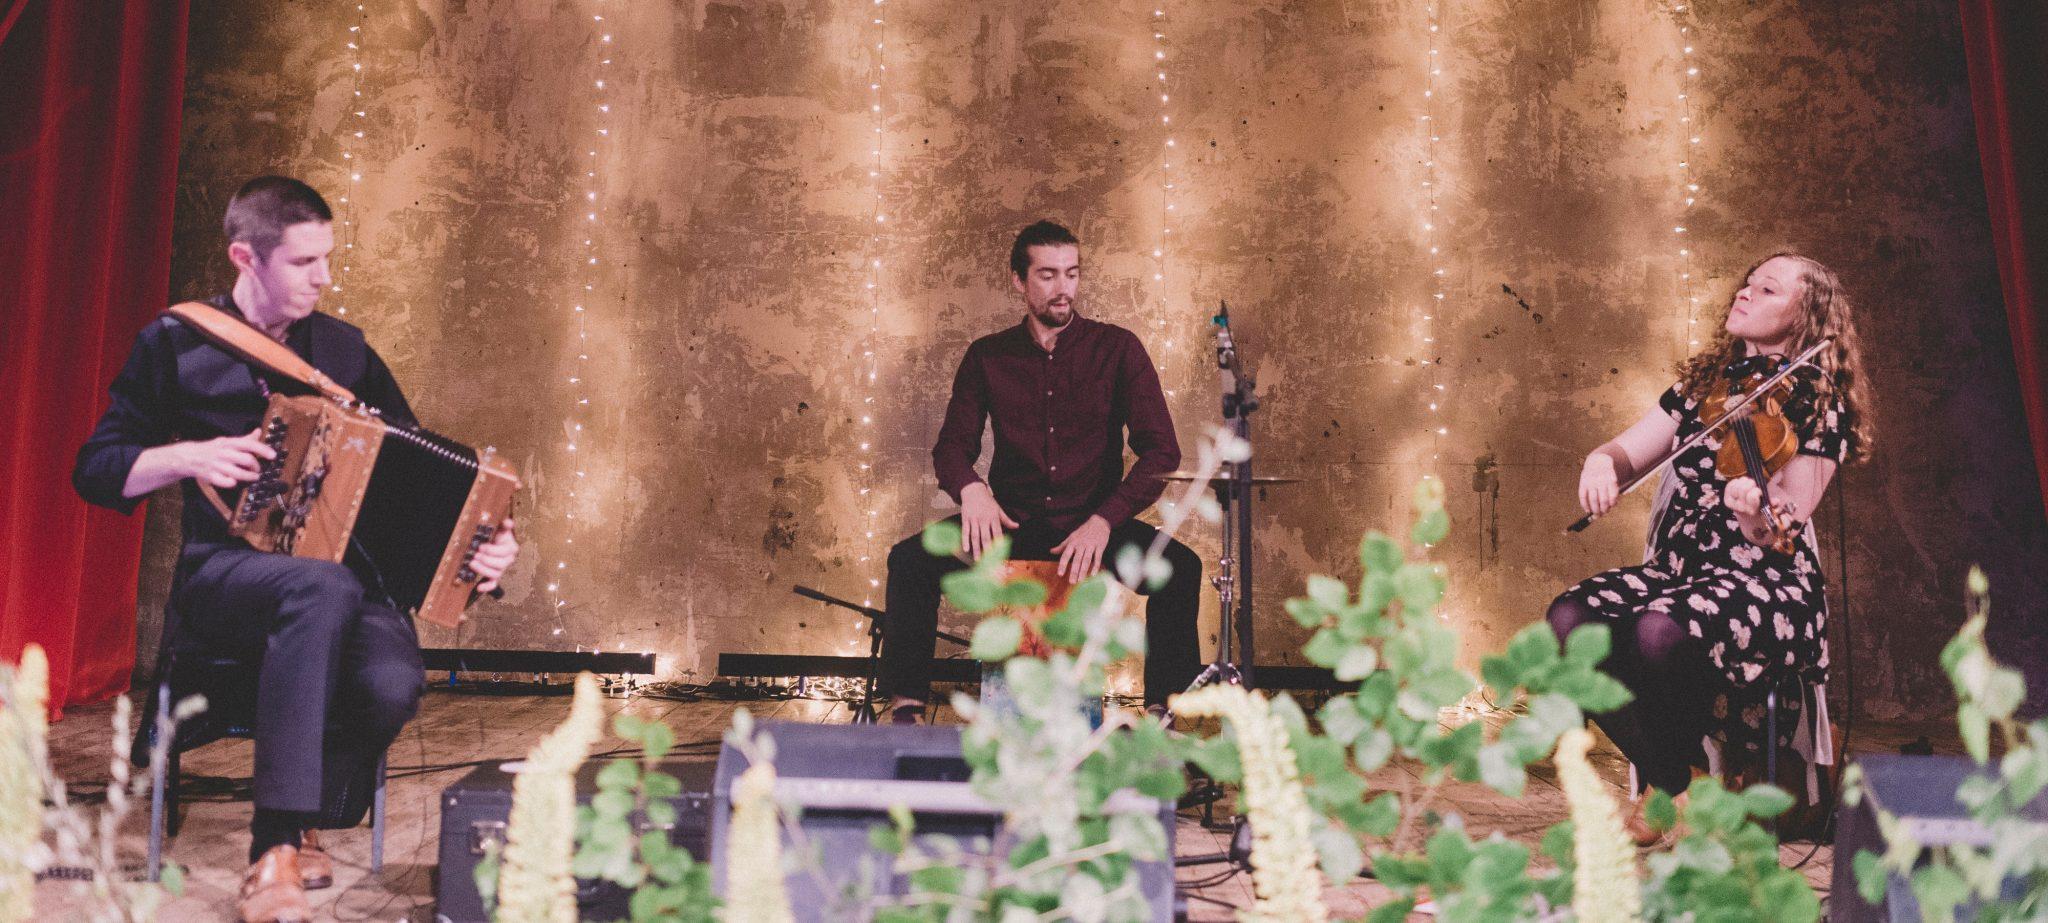 View More: http://razialife.pass.us/jen-and-andrews-wedding-wiltonmusichall